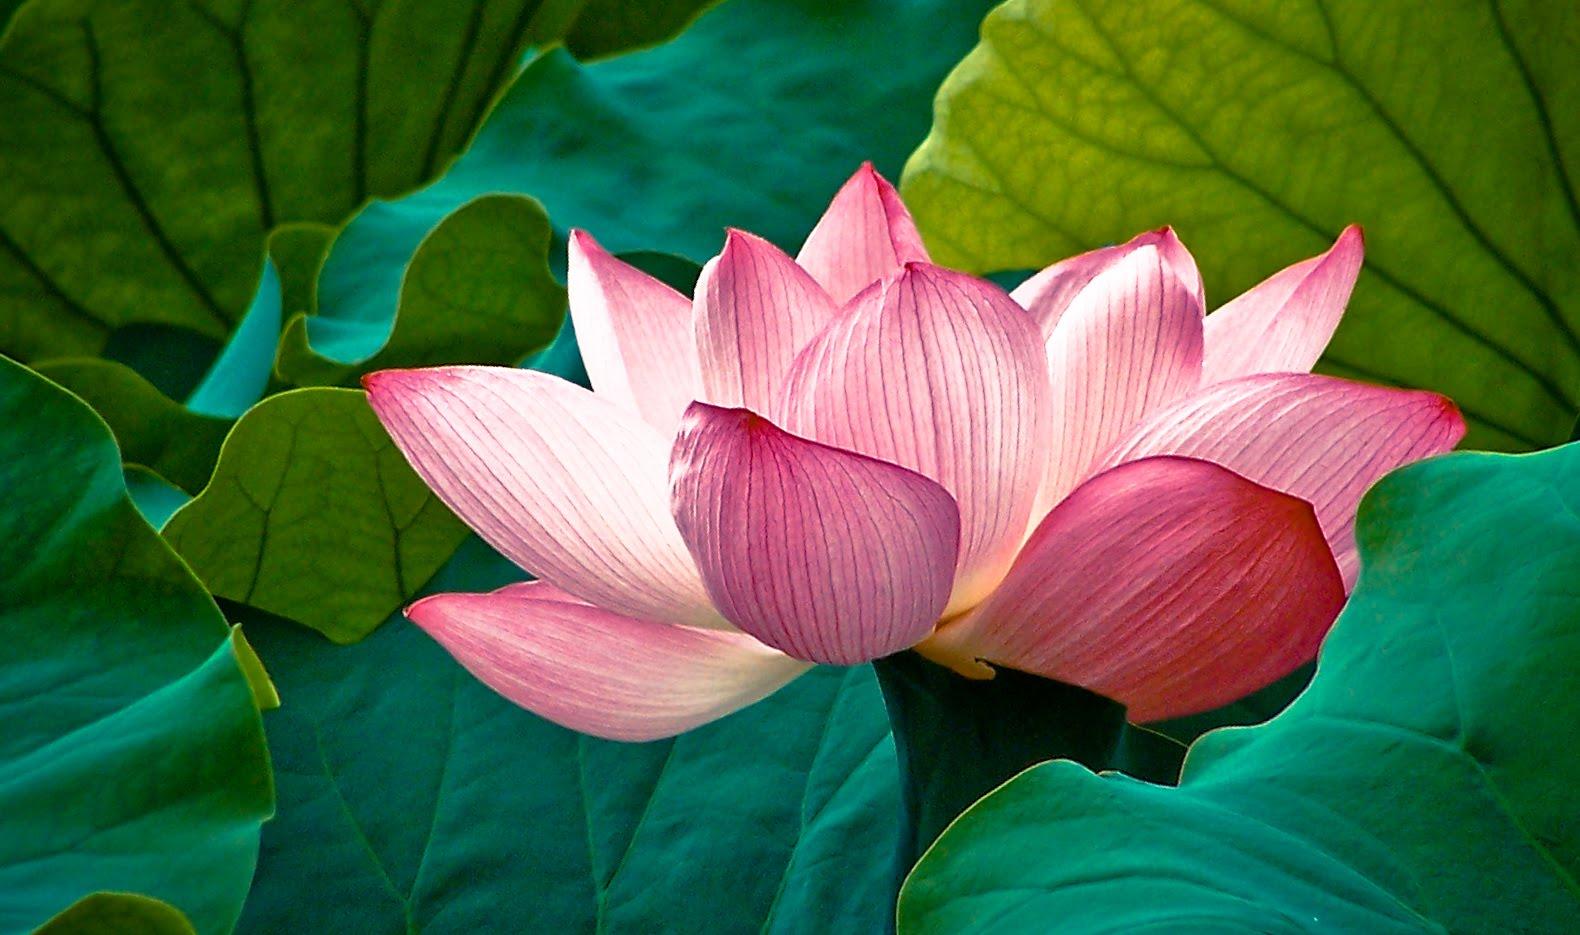 flor de loto��� - Taringa!